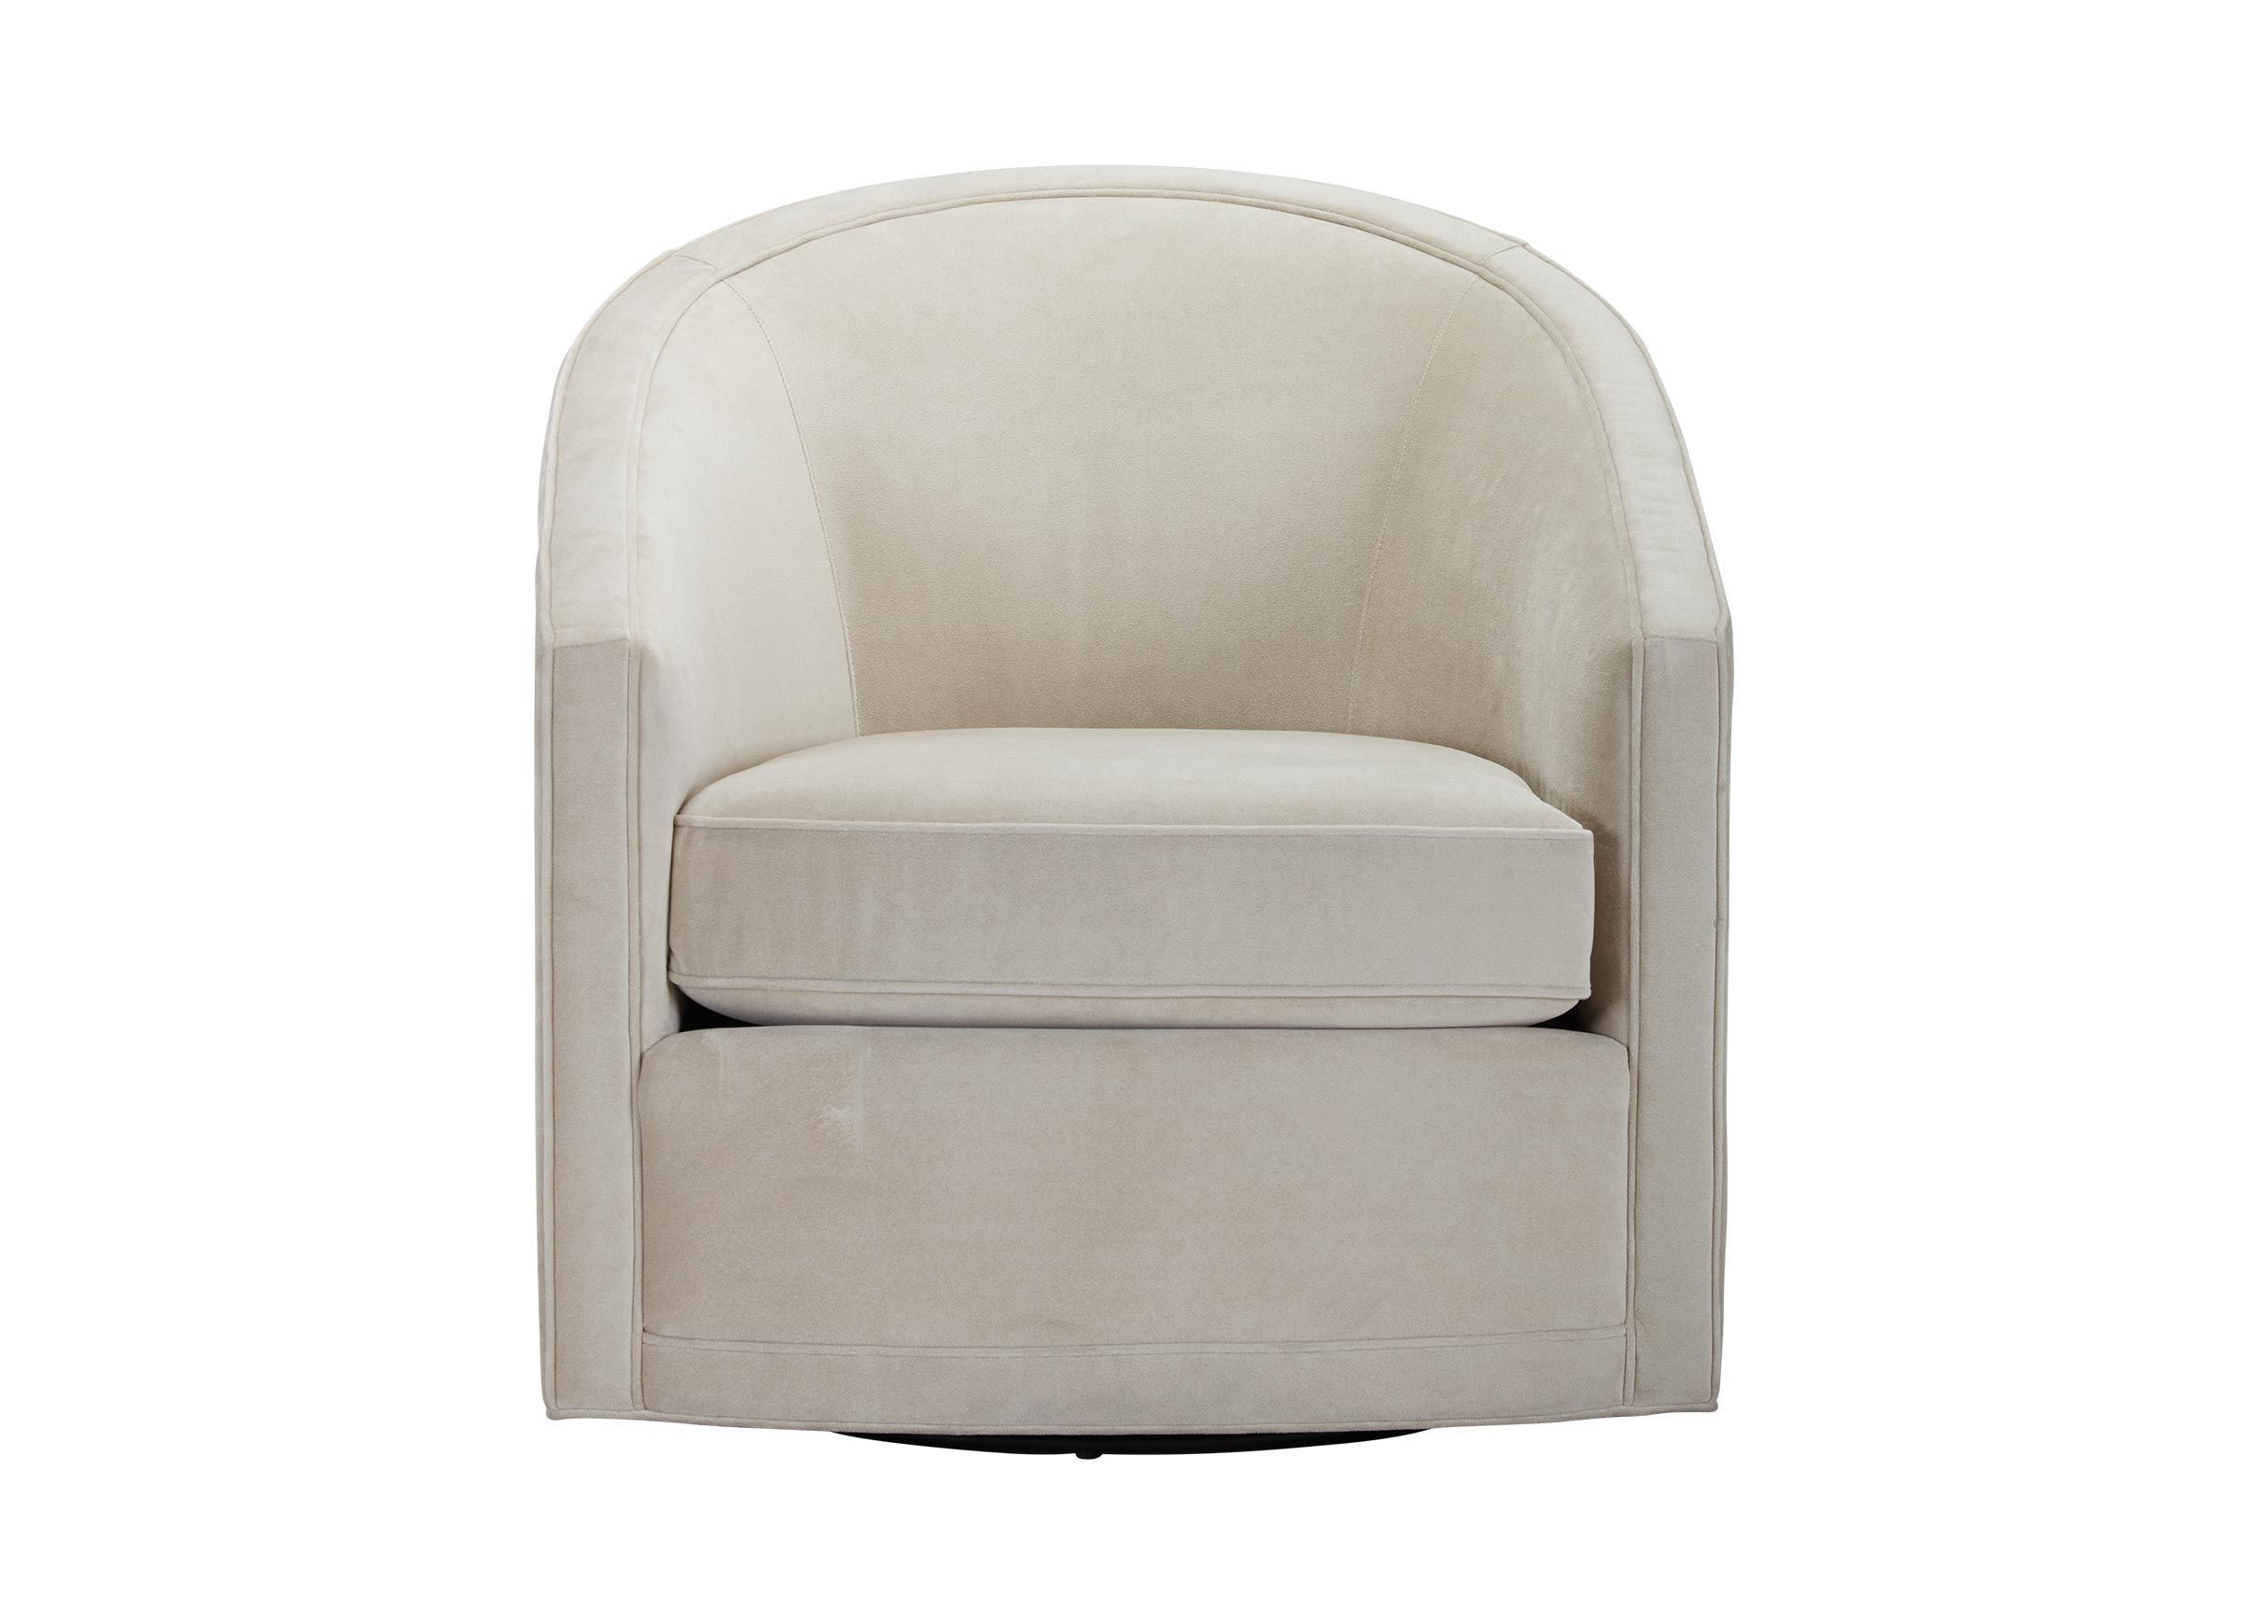 33 Wide Swivel Down Cushion Armchair Swivel Glider Chair Paula Deen Furniture Craftmaster Furniture